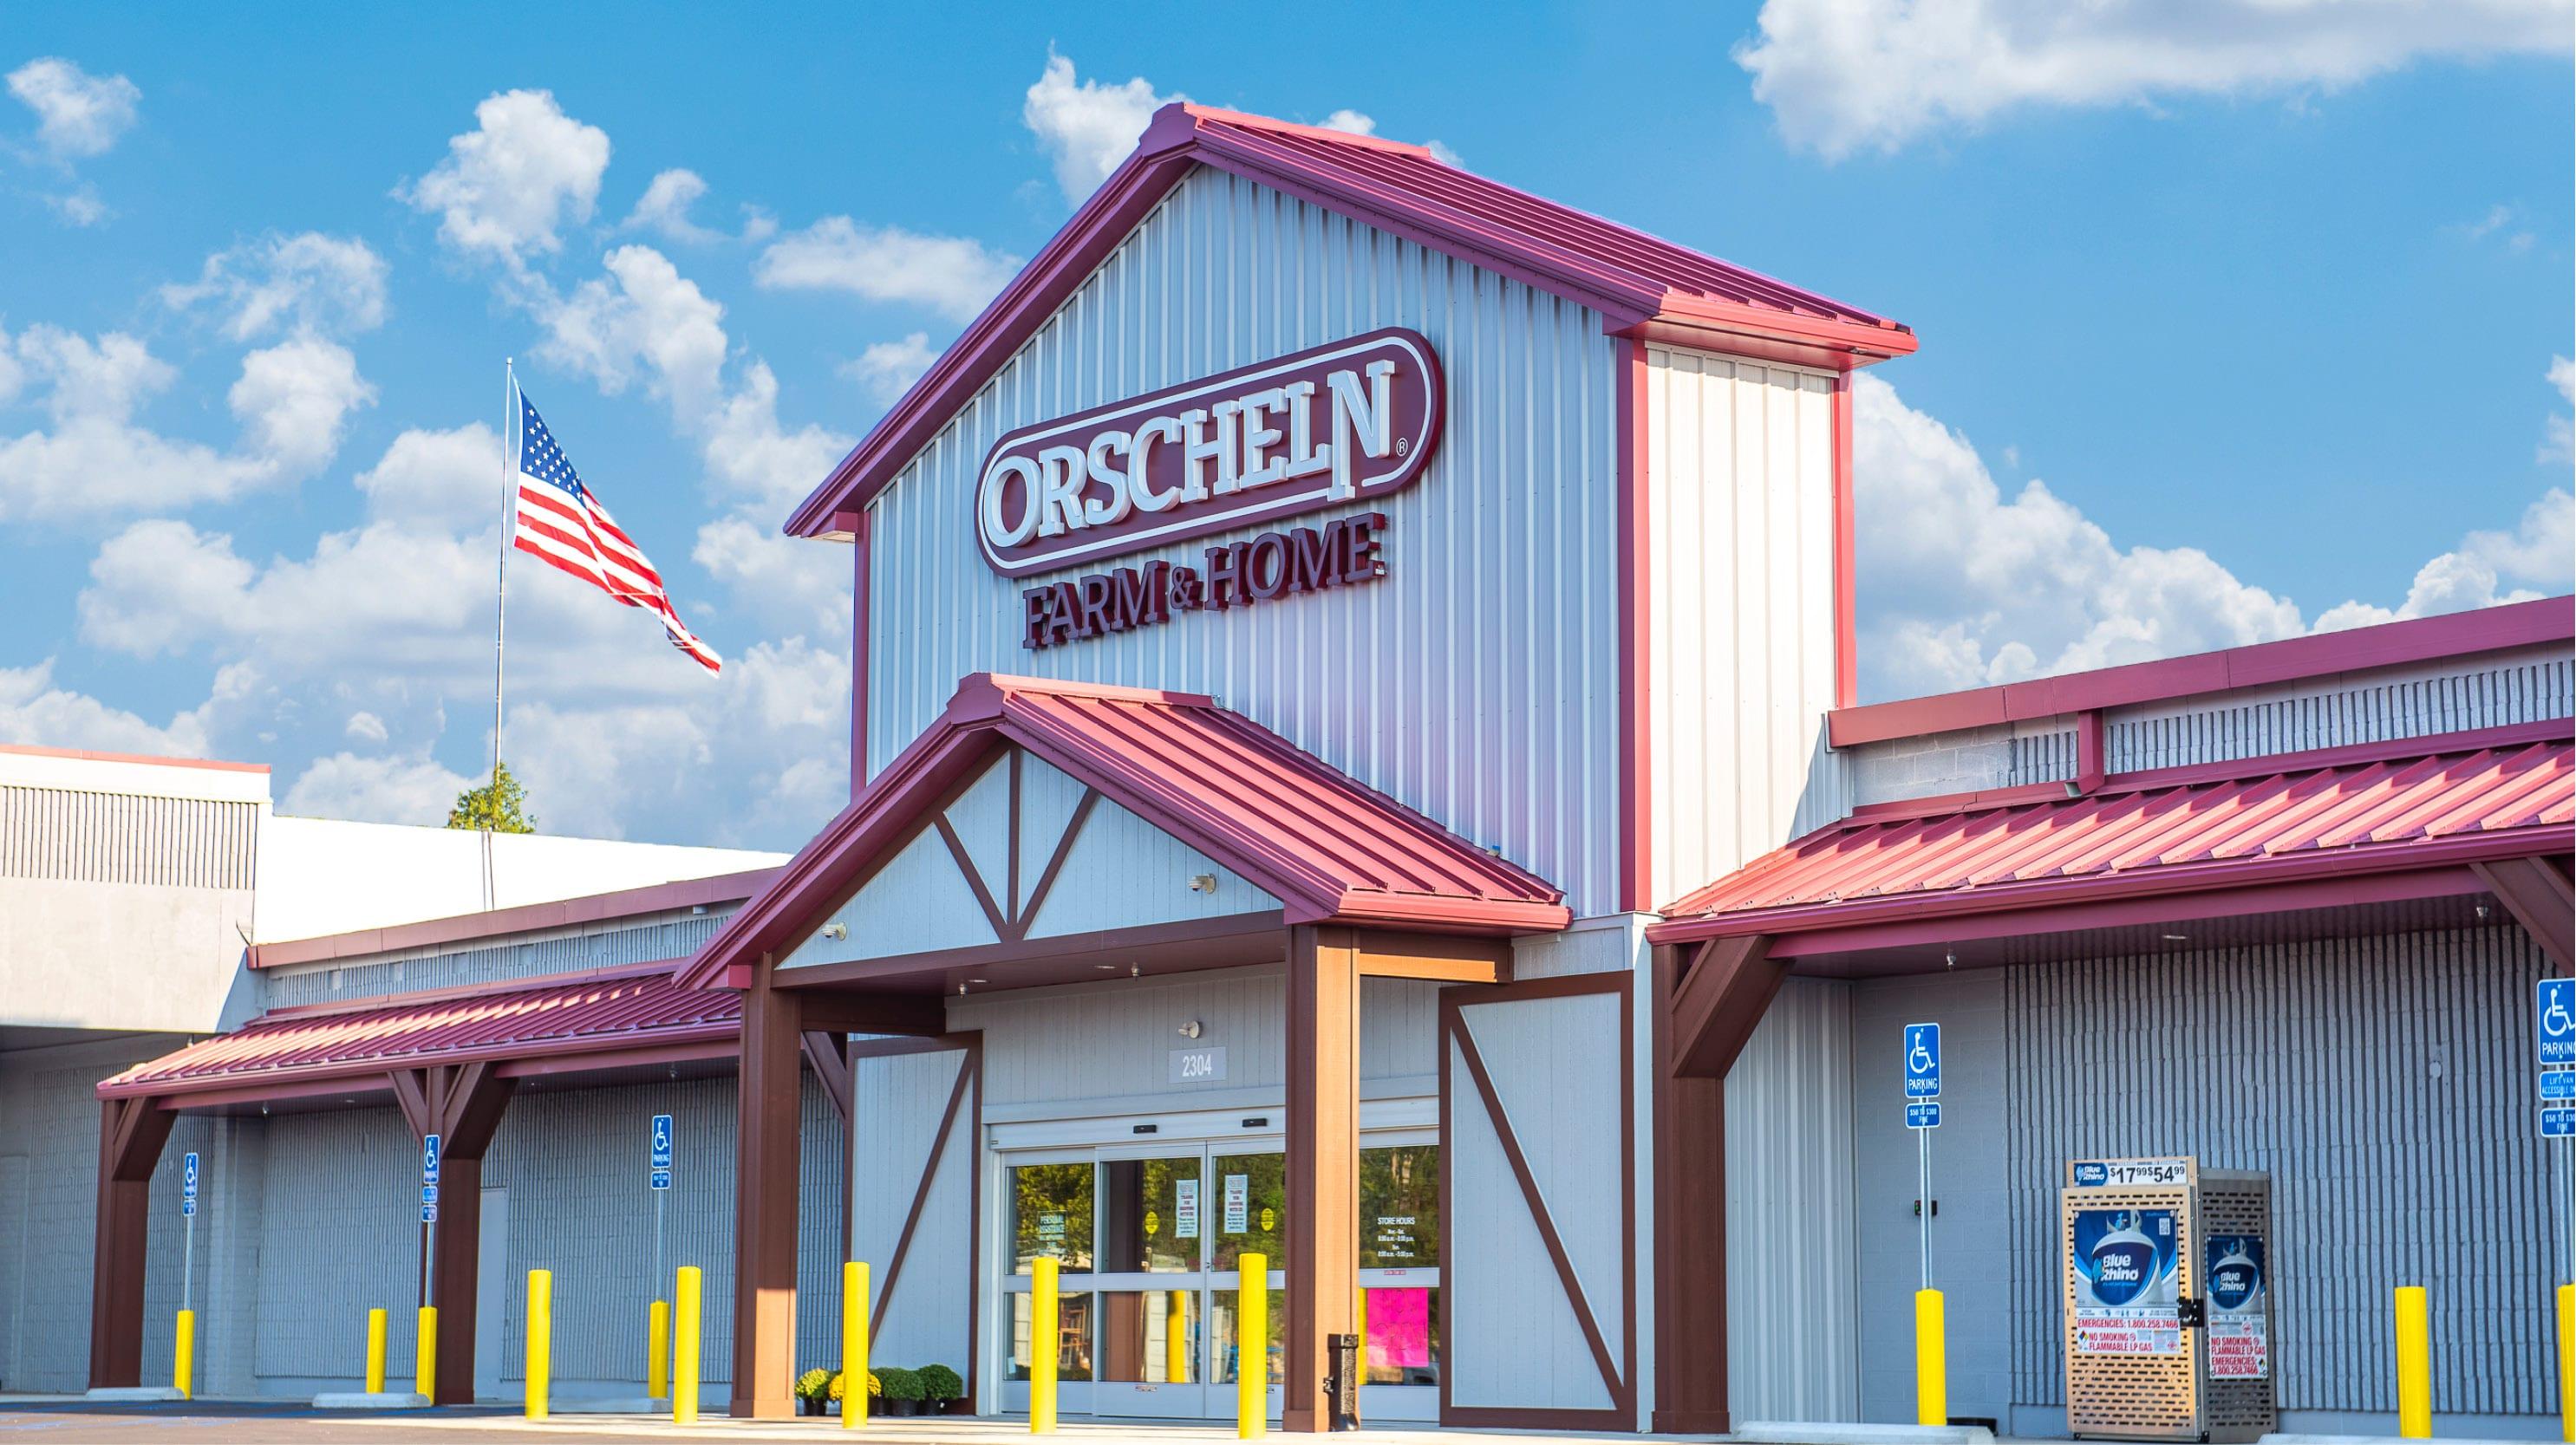 Front view of Orscheln Farm & Home Store in Jefferson City, Missouri 65109